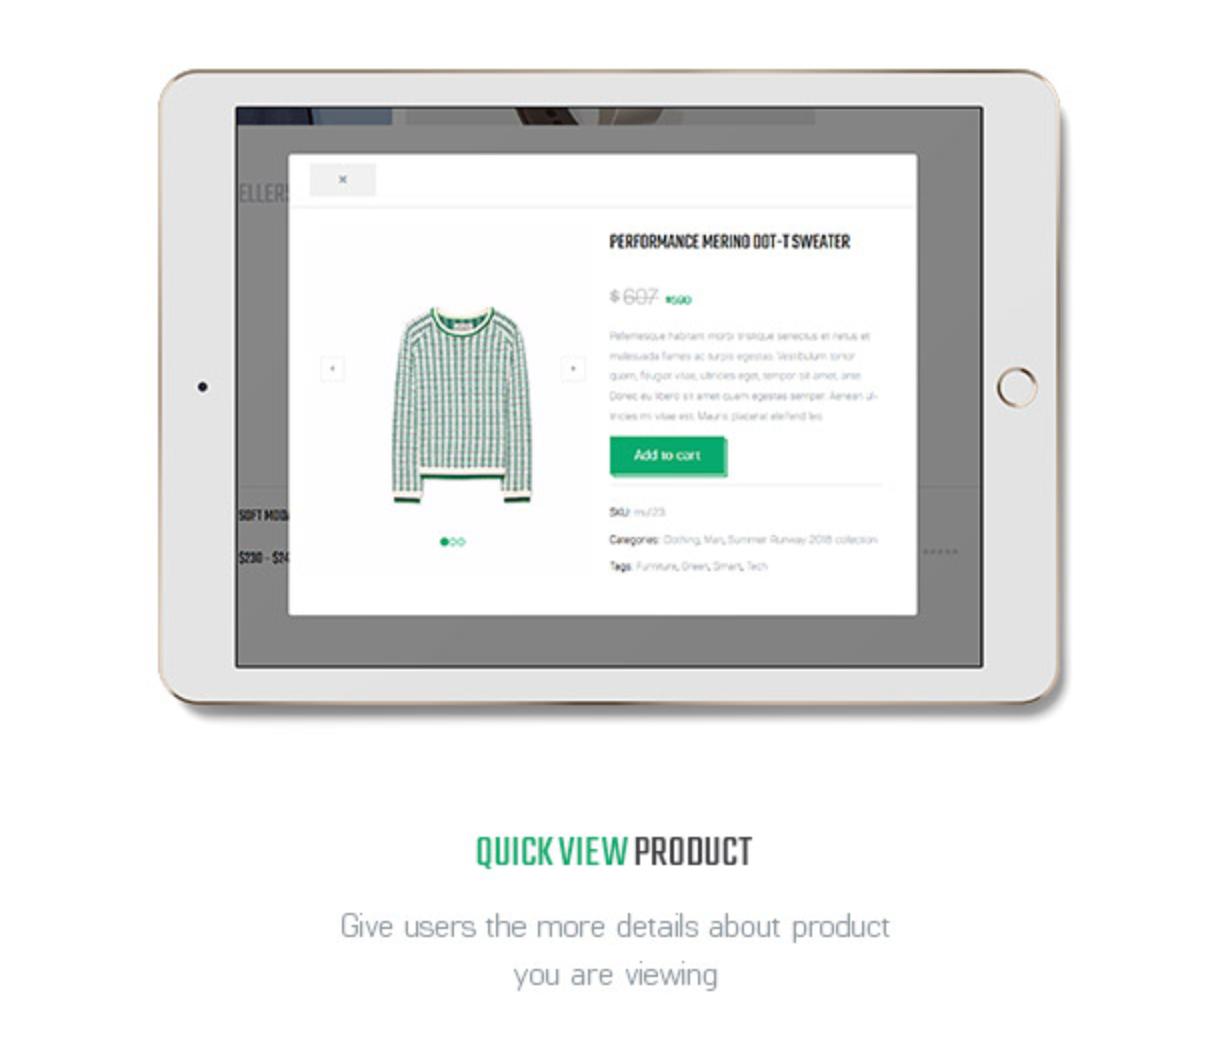 Littlemonsters Product Quick View Sport Shop Woocommerce WordPress Themes